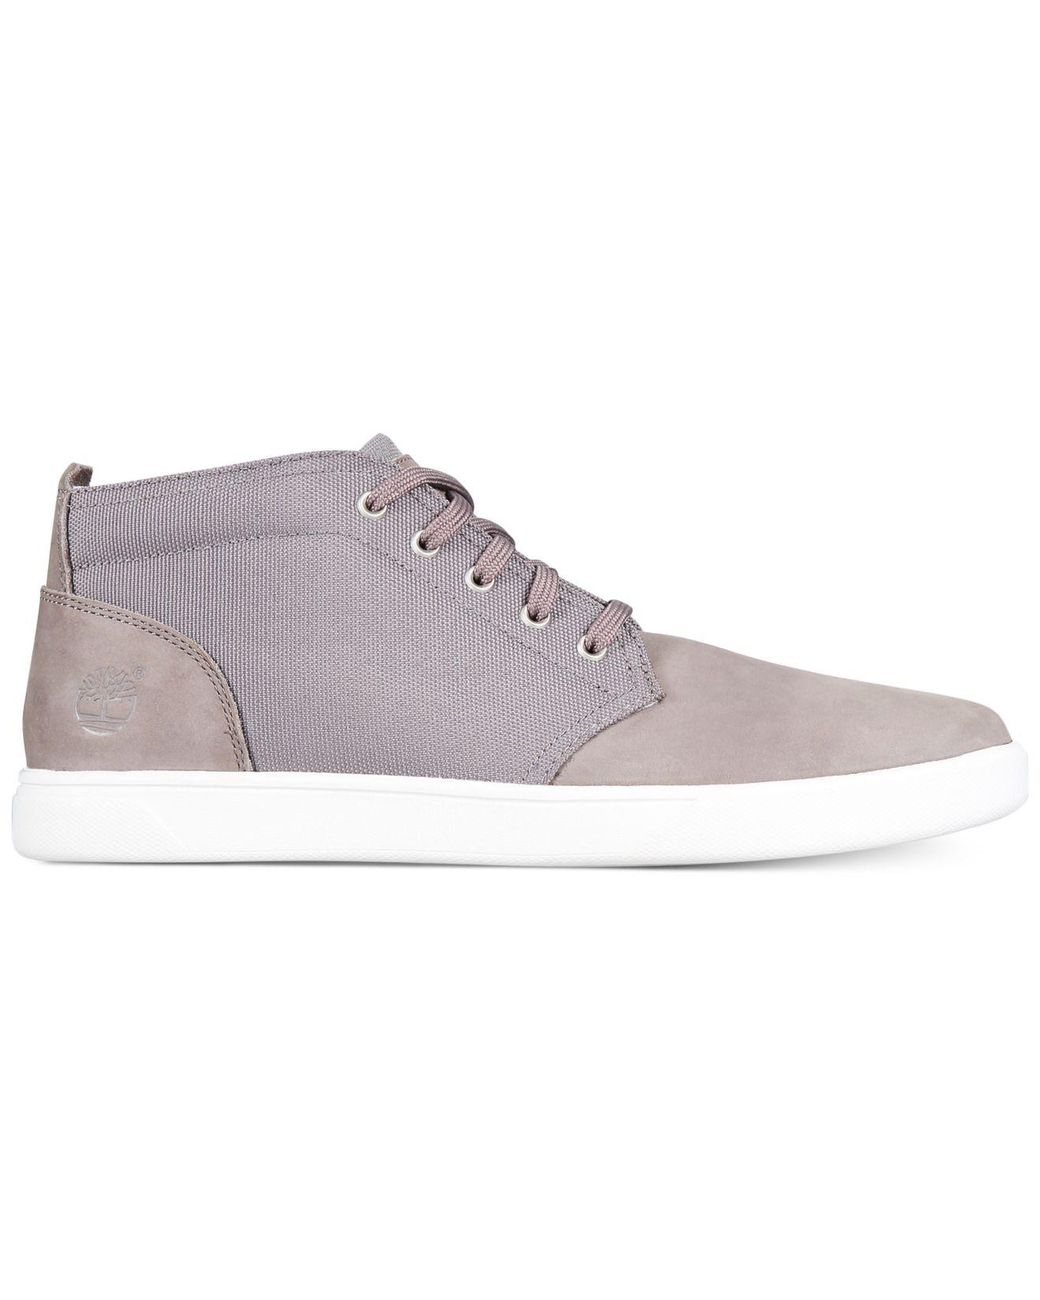 c304e6a40295d Timberland Men's Groveton Chukka Sneakers in Gray for Men - Lyst